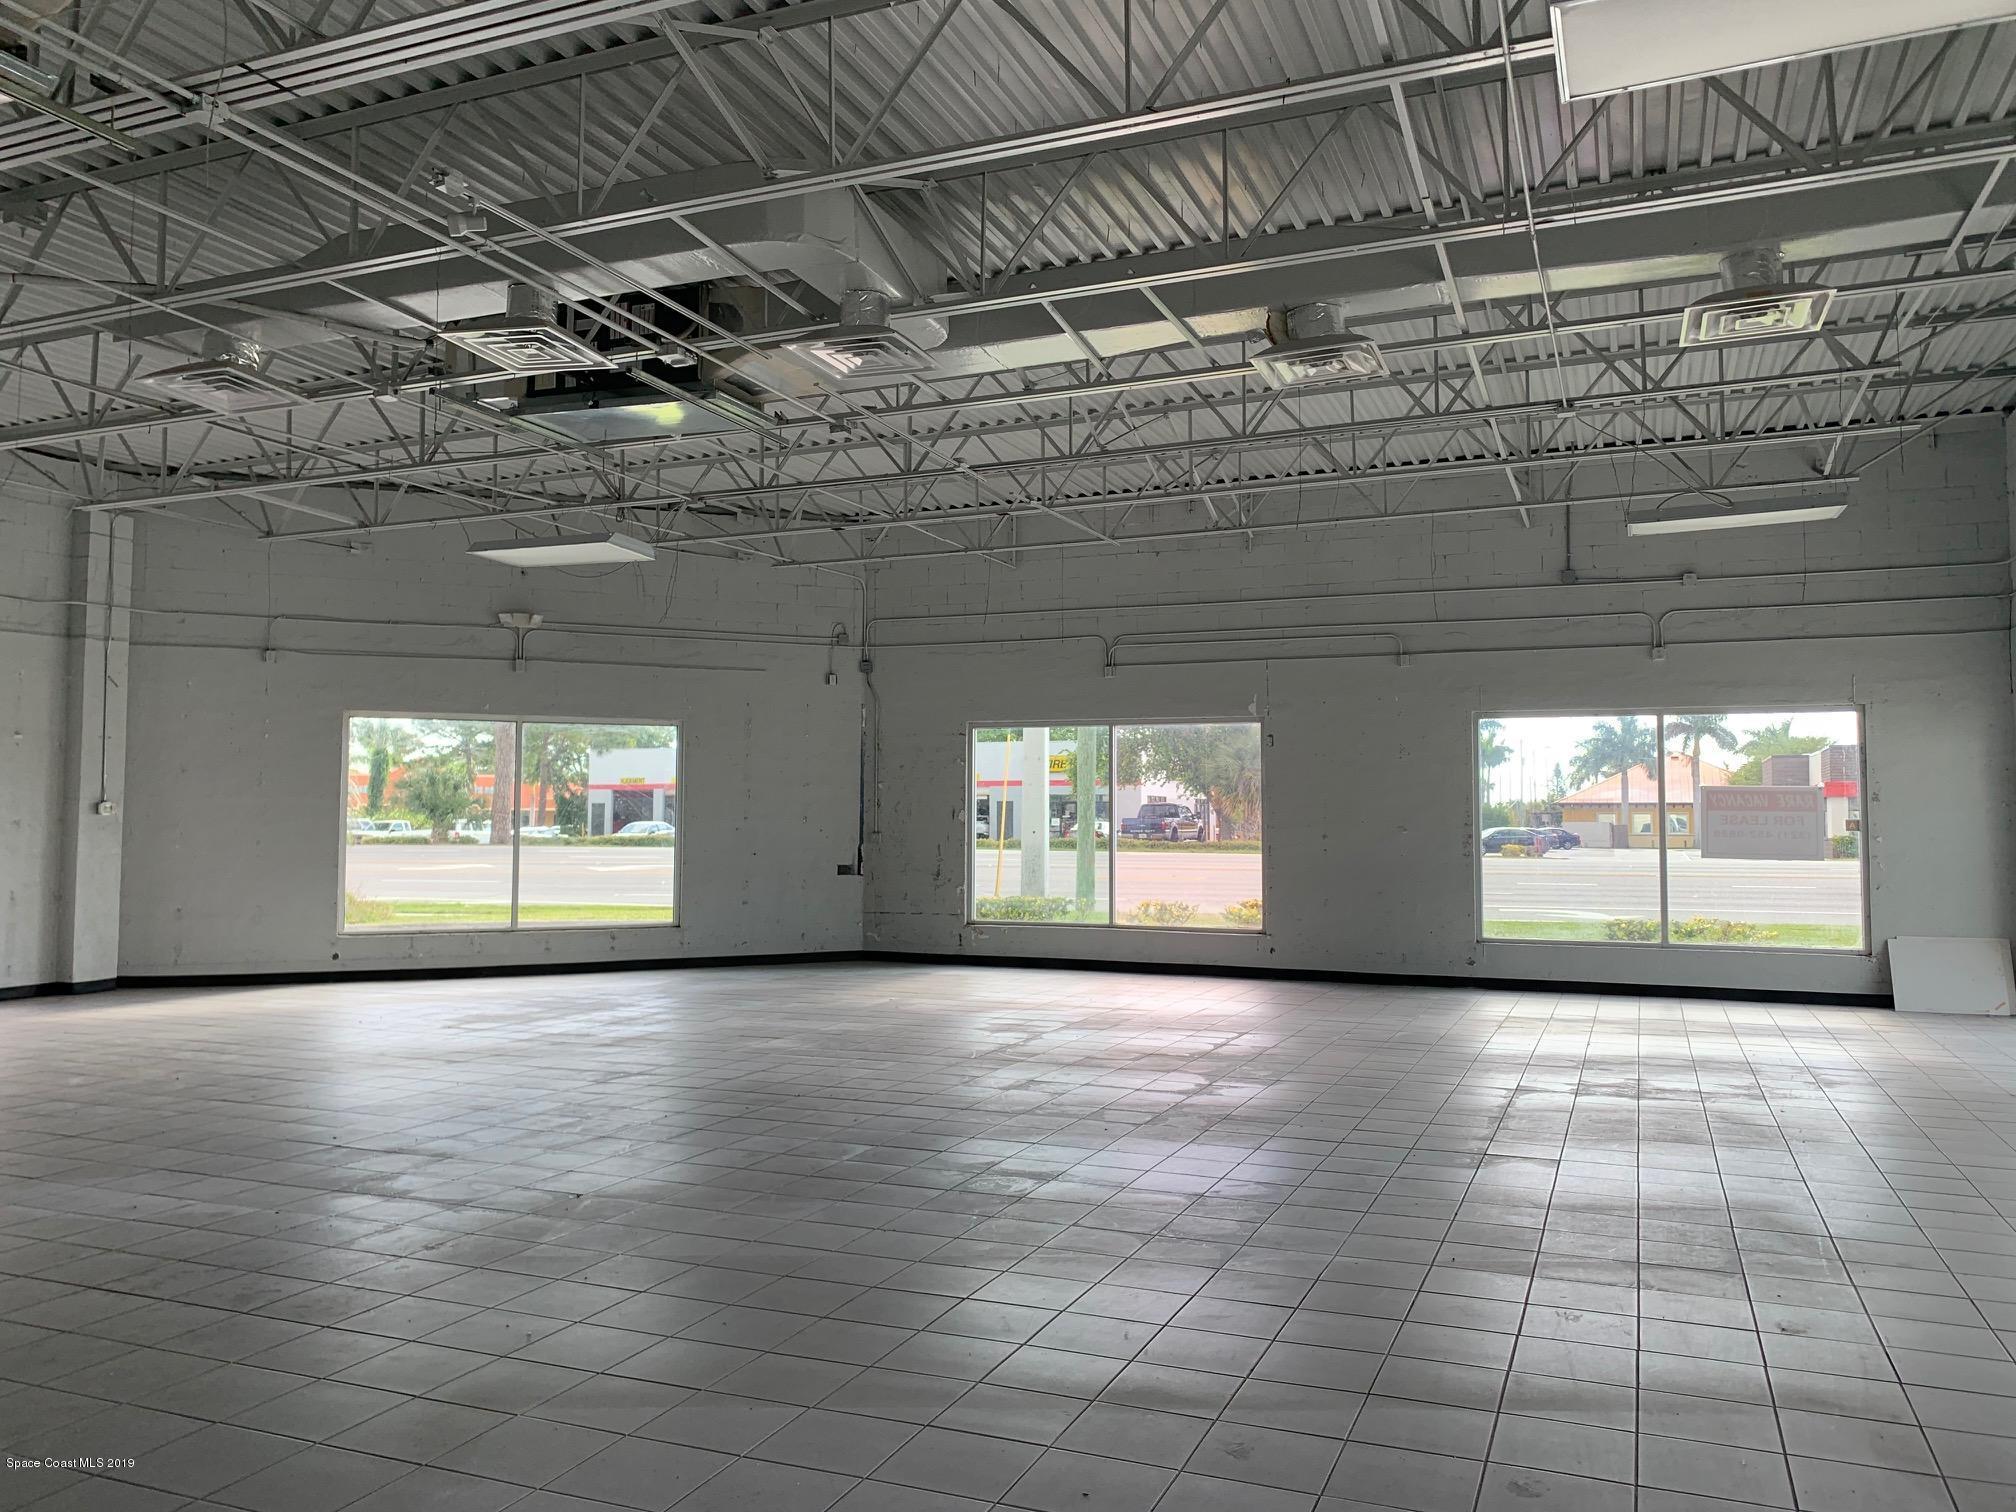 Additional photo for property listing at 925 N Courtenay Merritt Island, Florida 32953 United States